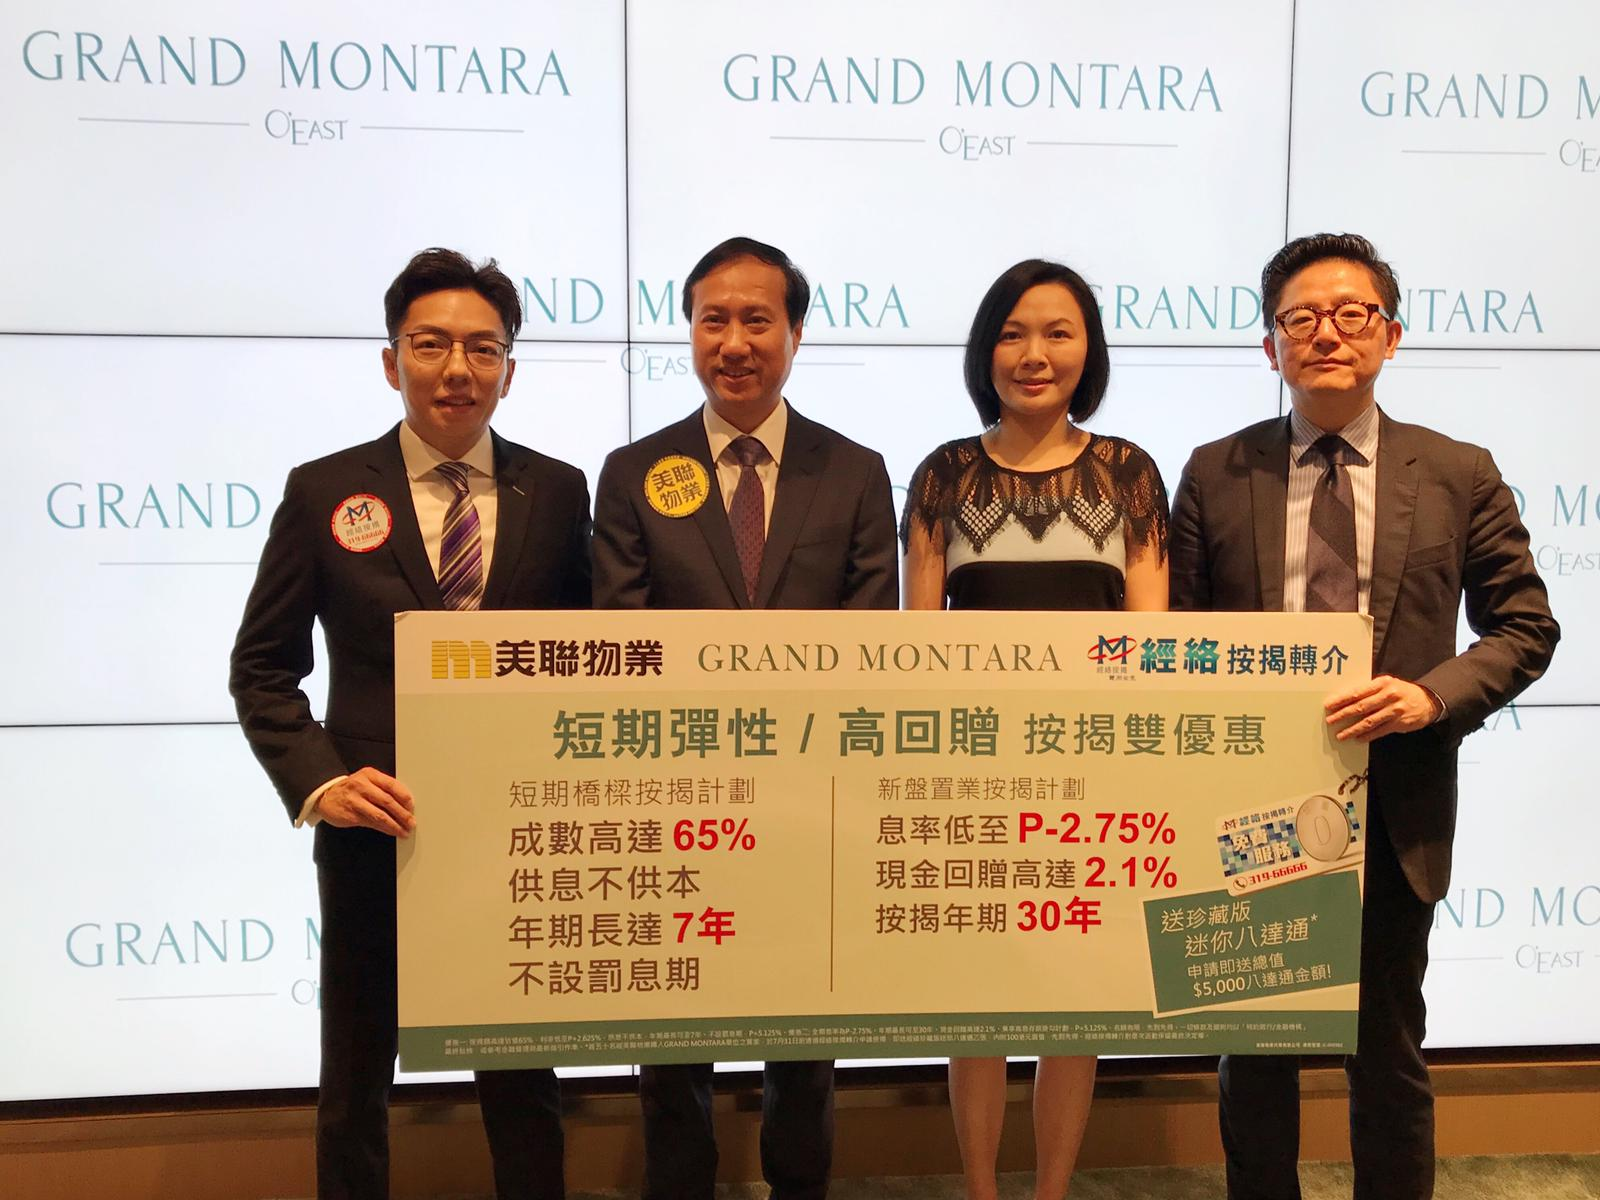 GRAND MONTARA周六開售504伙 暫錄逾百組大手客